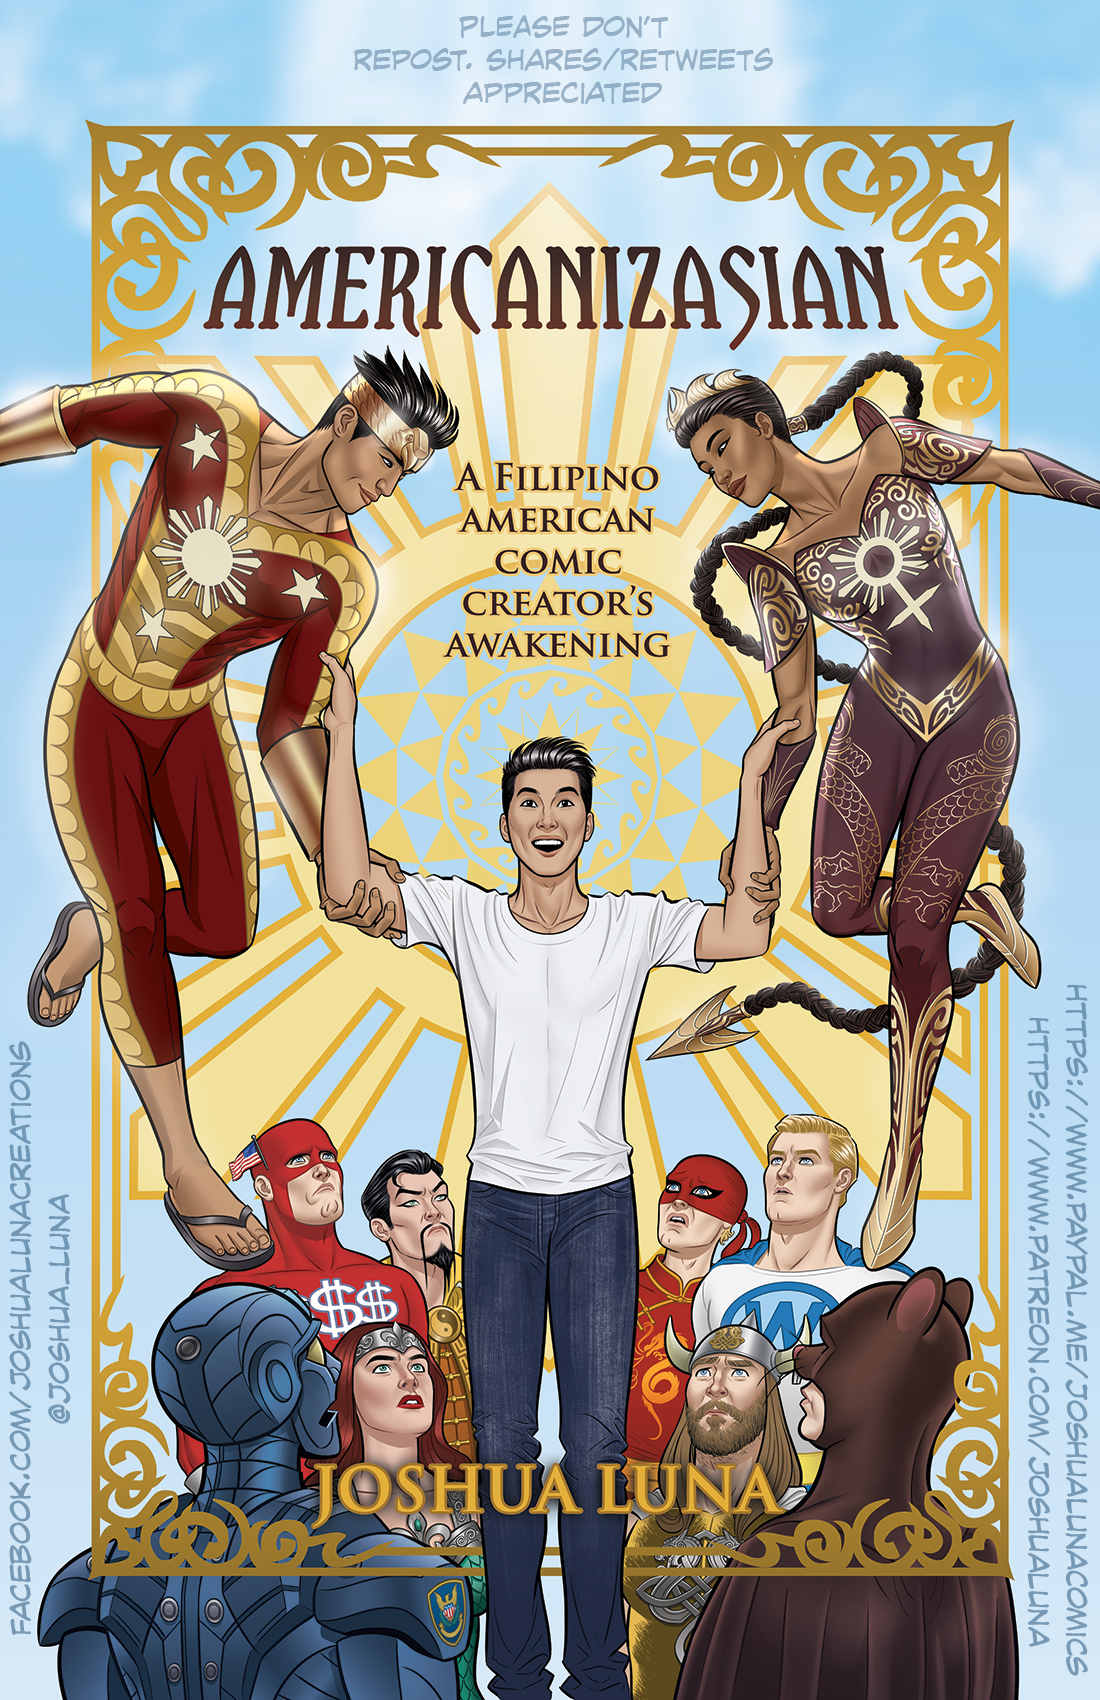 AMERICANIZASIAN cover art by Joshua Luna